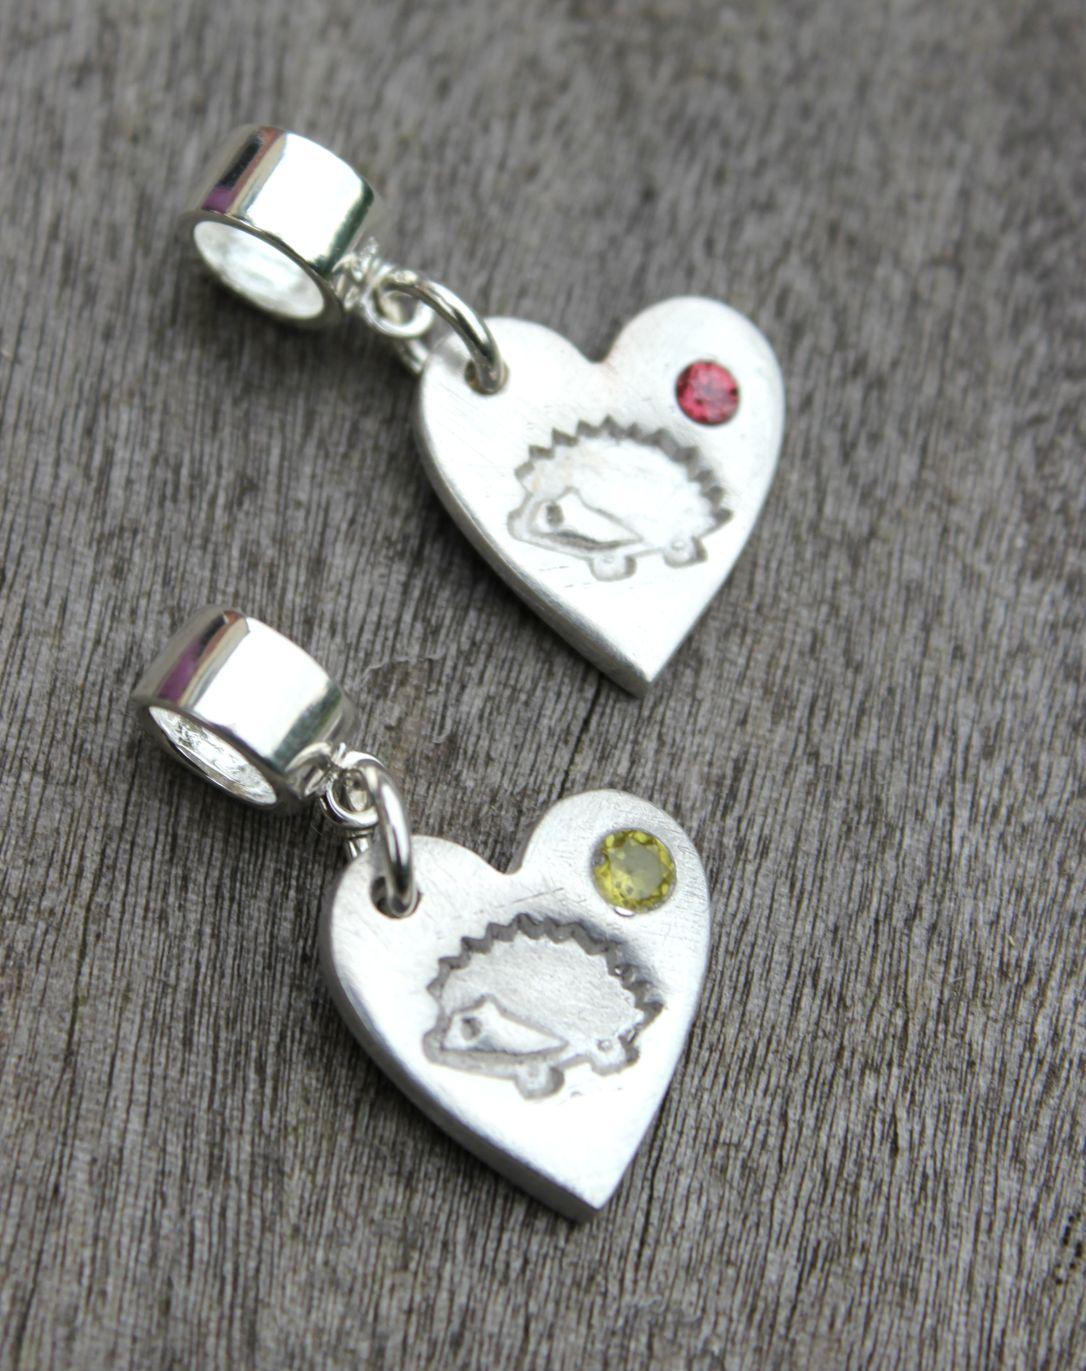 Birthstone hedgehog heart charms by little silver hedgehog.JPG